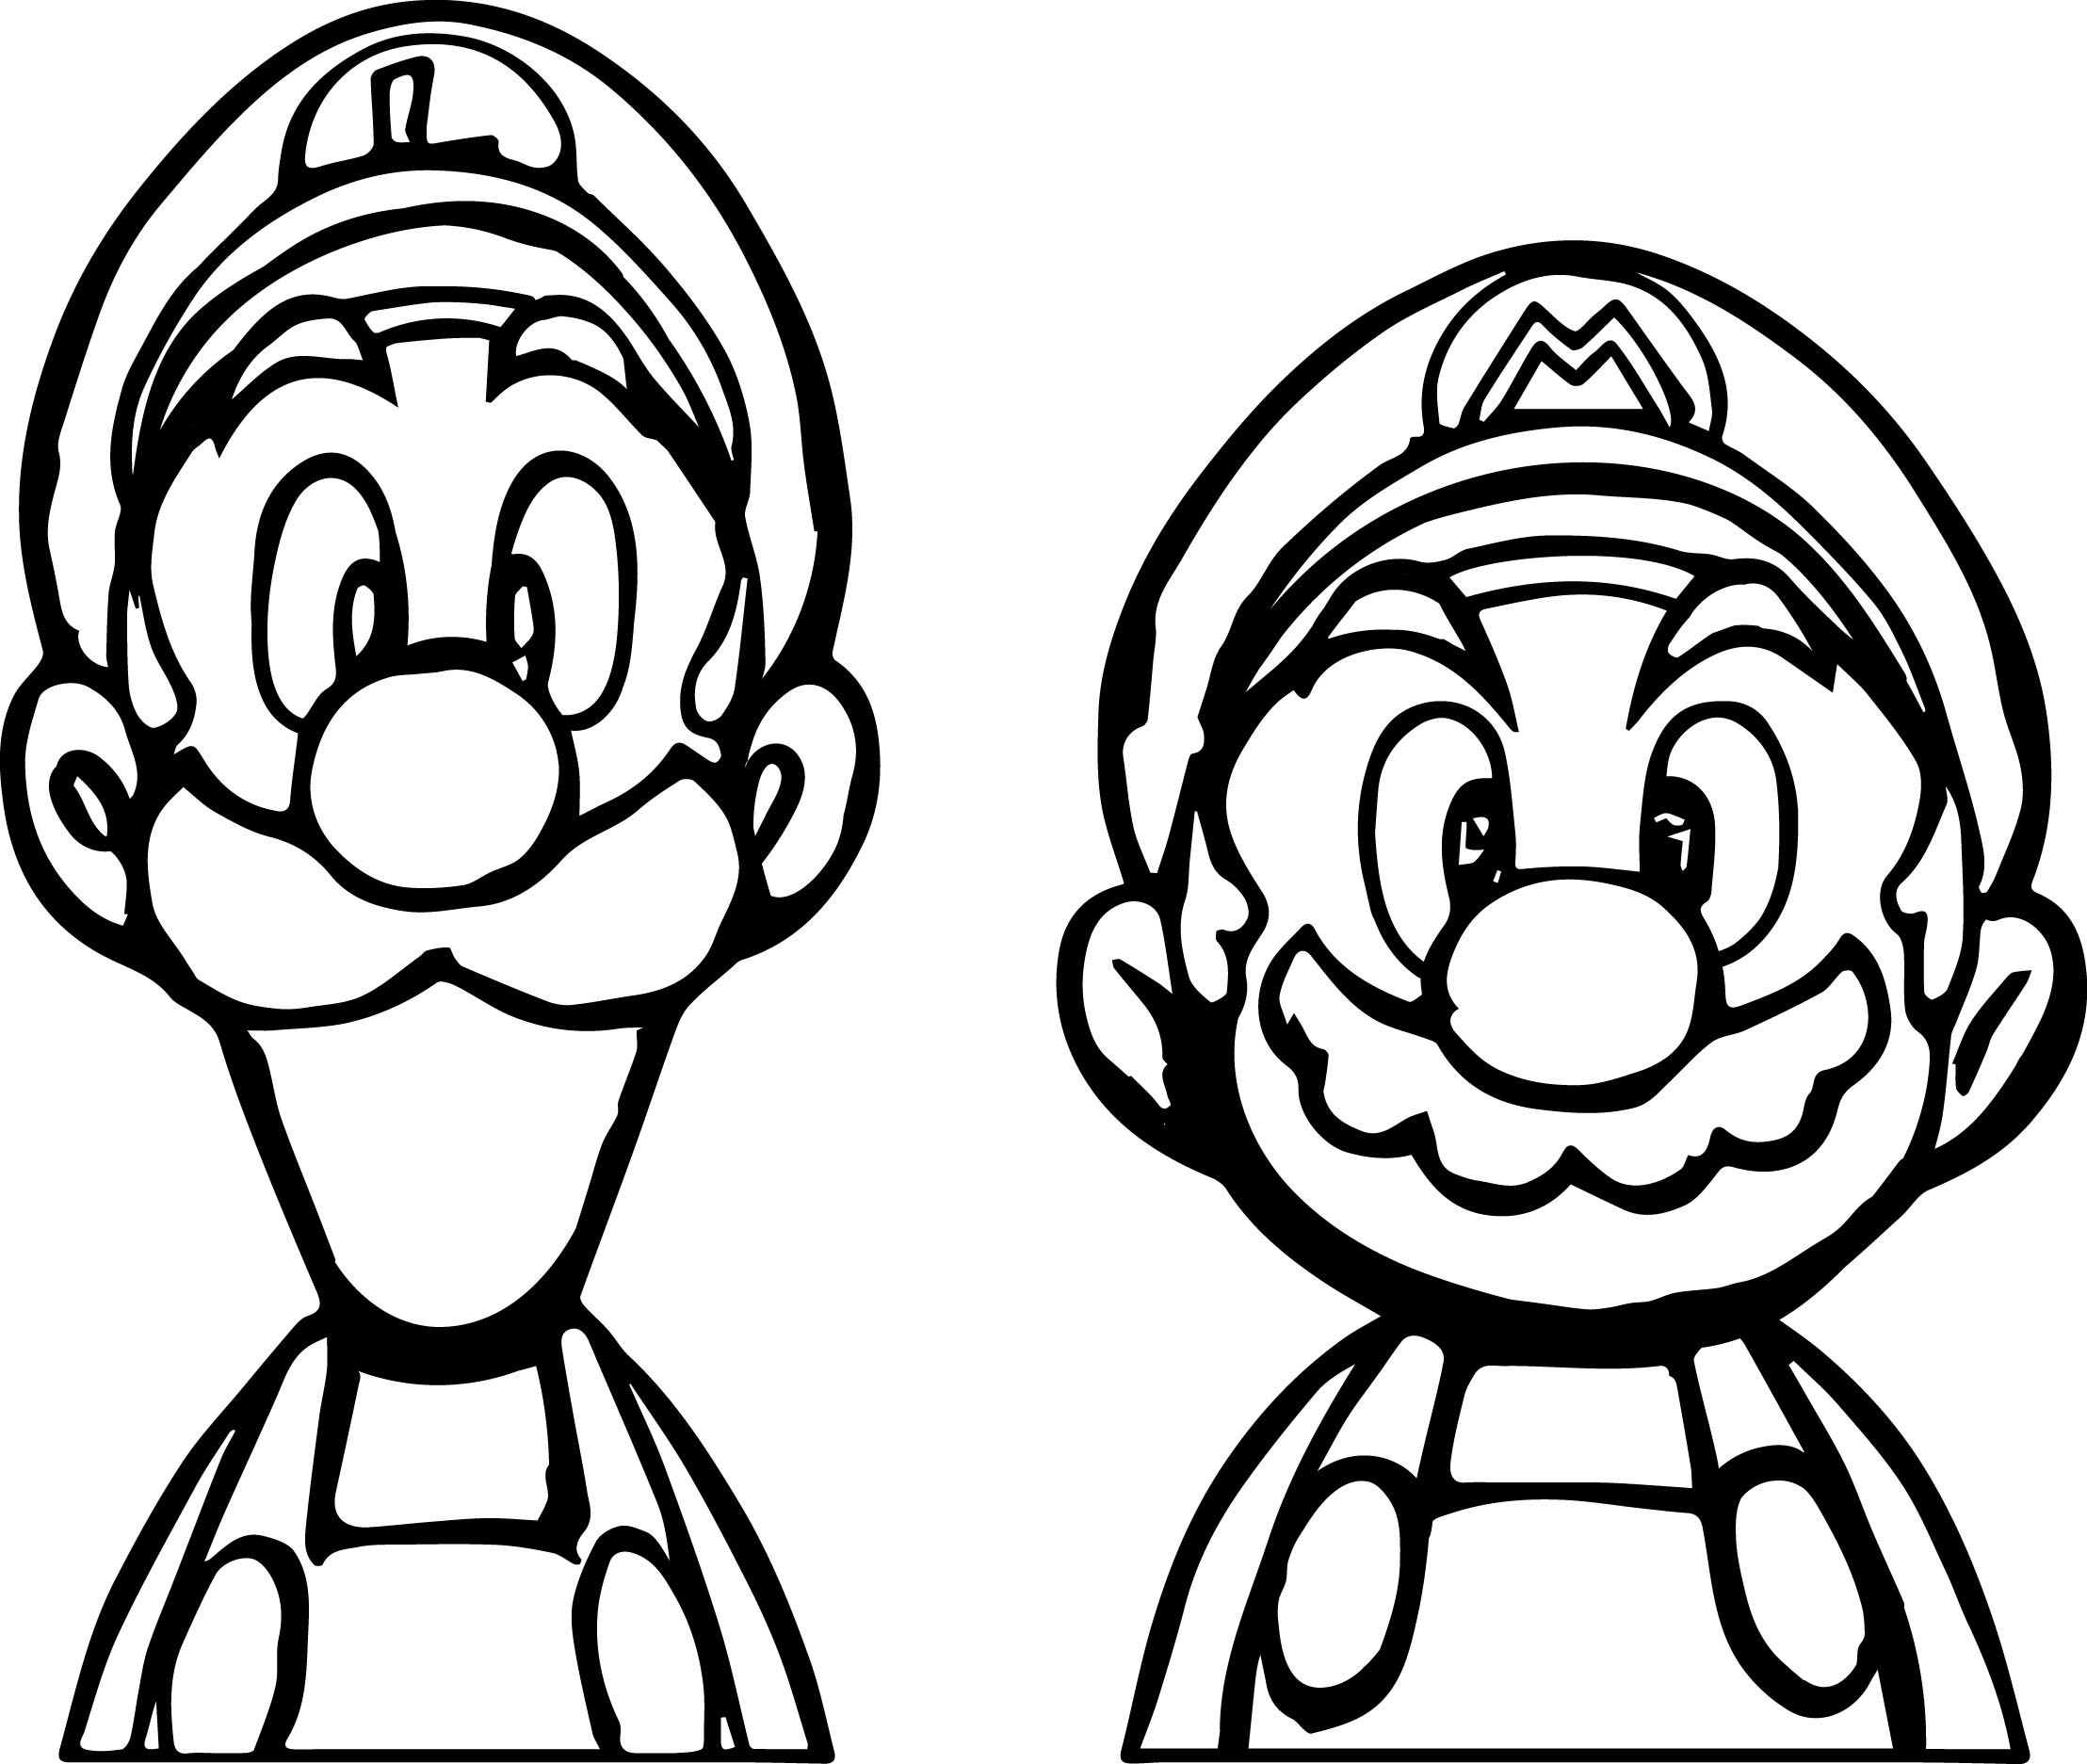 2216x1873 Mario Color Pages, Luigi And Mario Coloring Pages